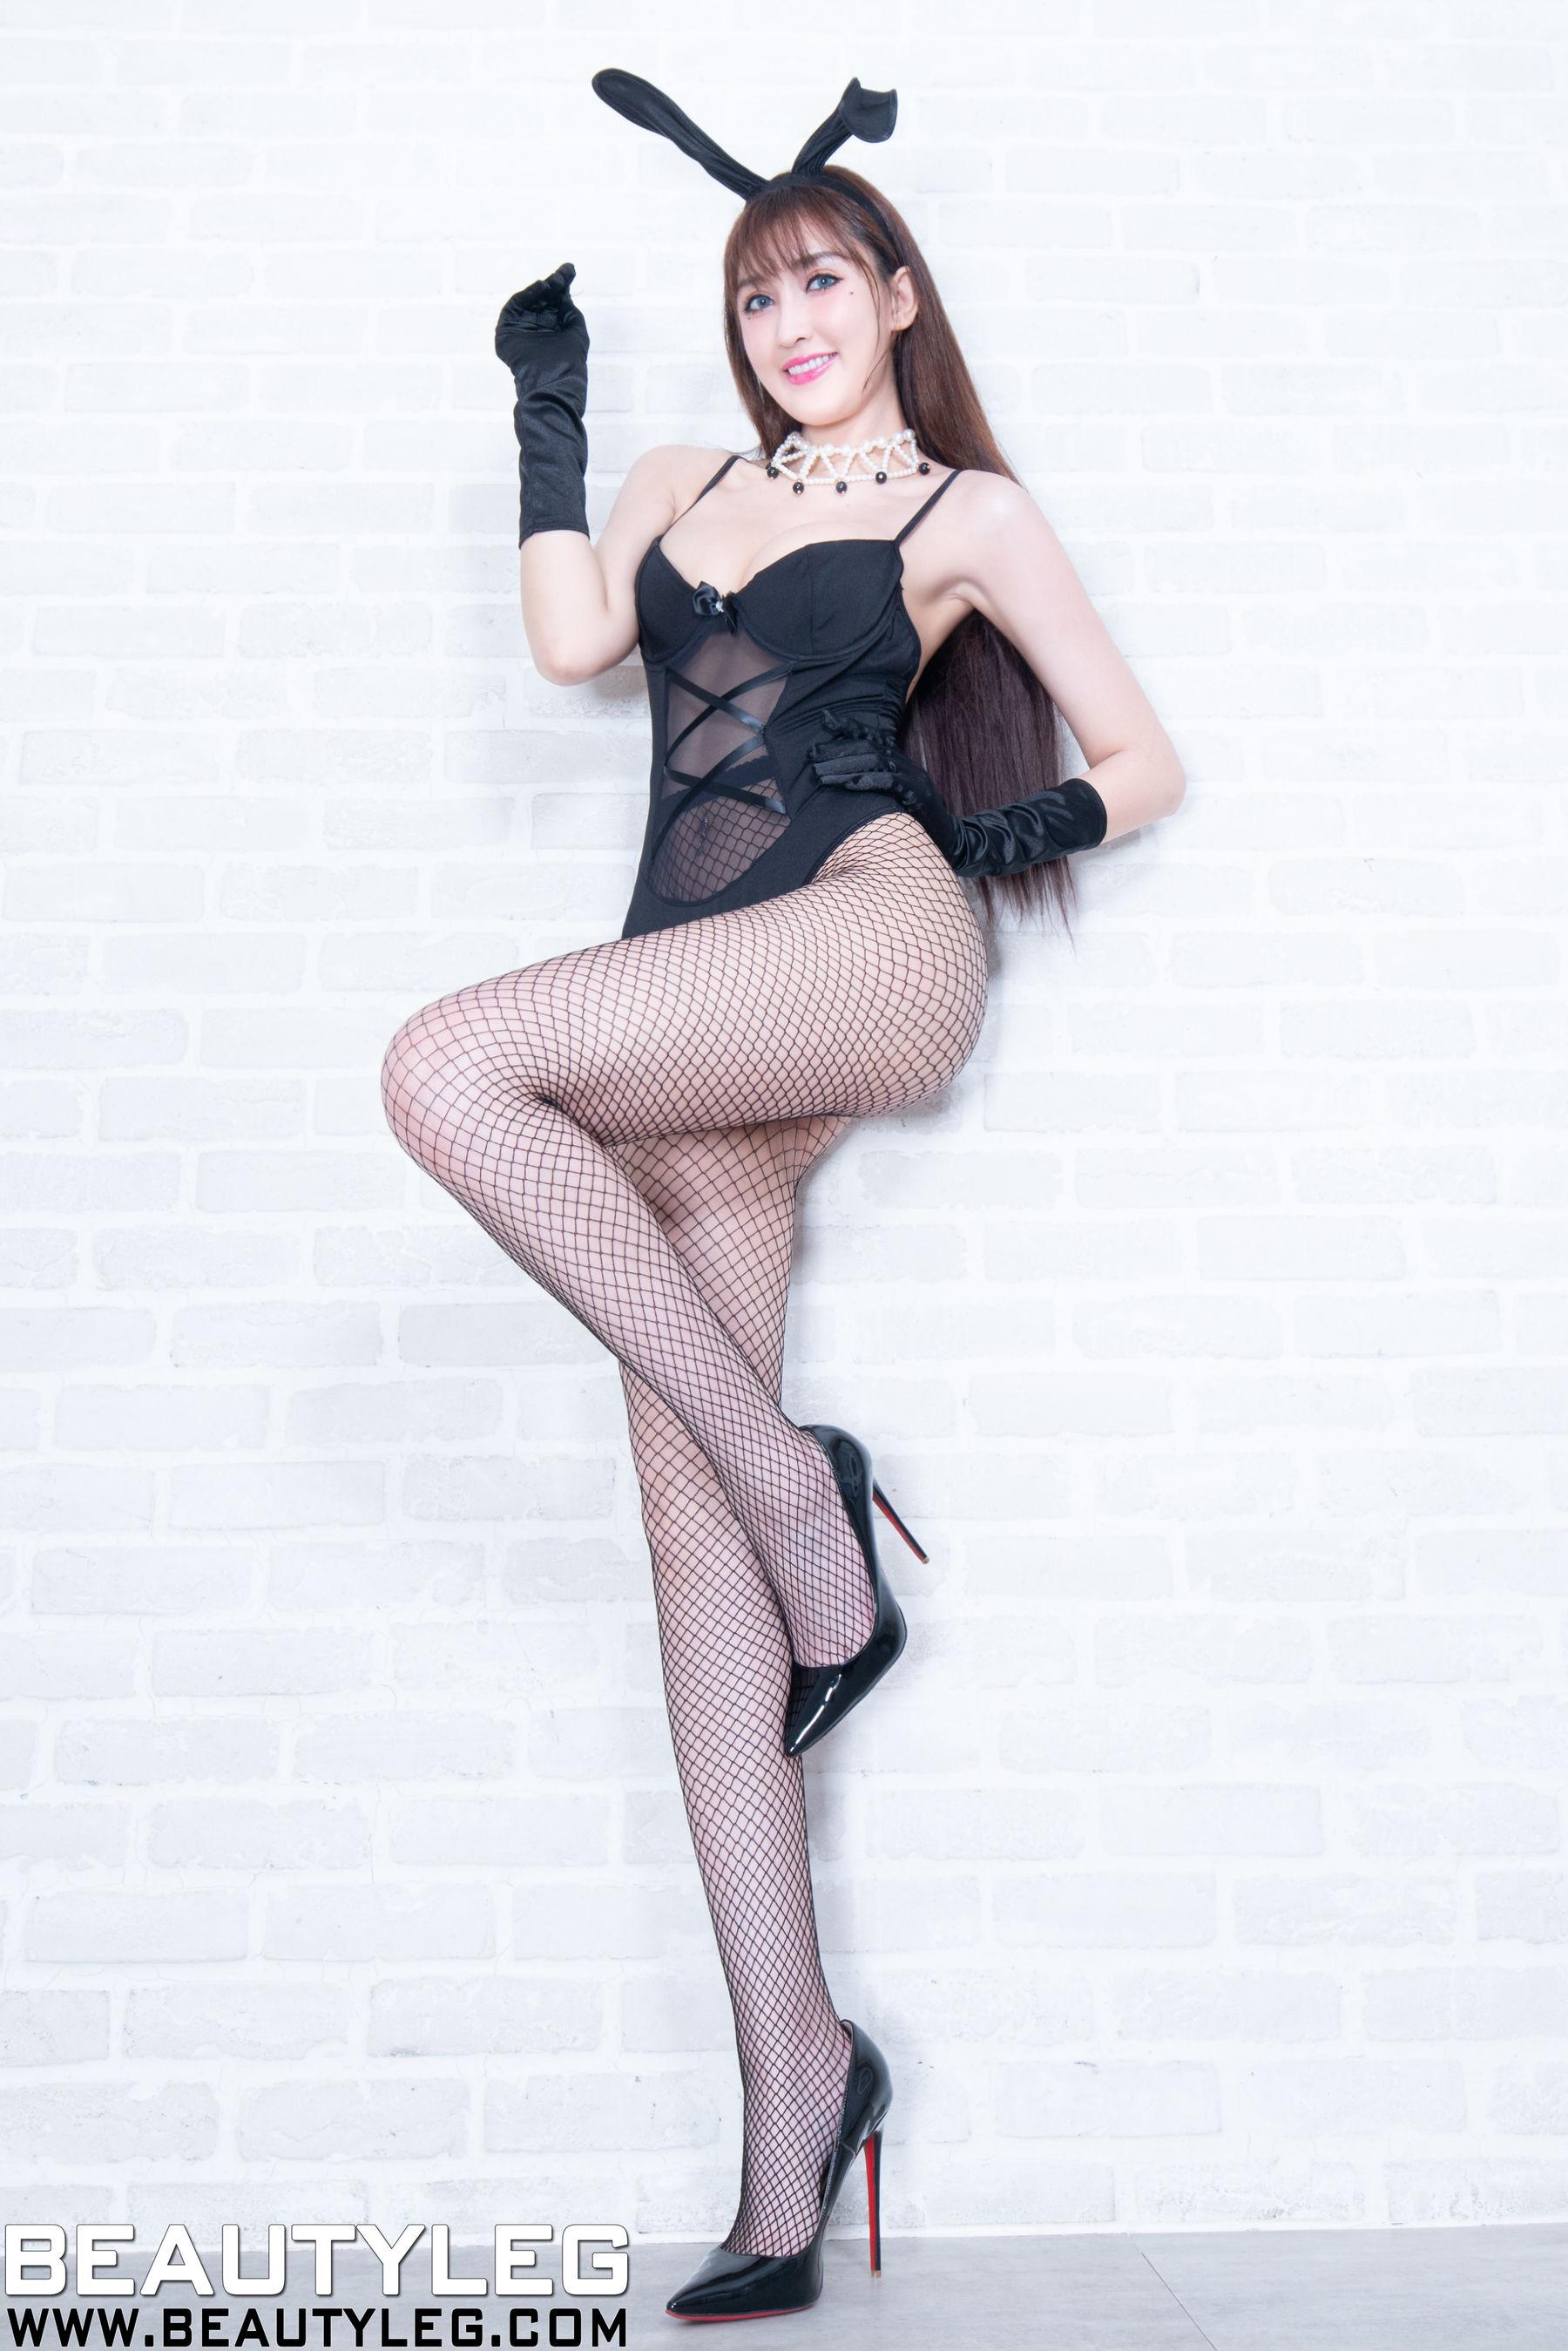 VOL.799 [Beautyleg]兔女郎网袜:任育萱(腿模Vanessa)超高清个人性感漂亮大图(58P)